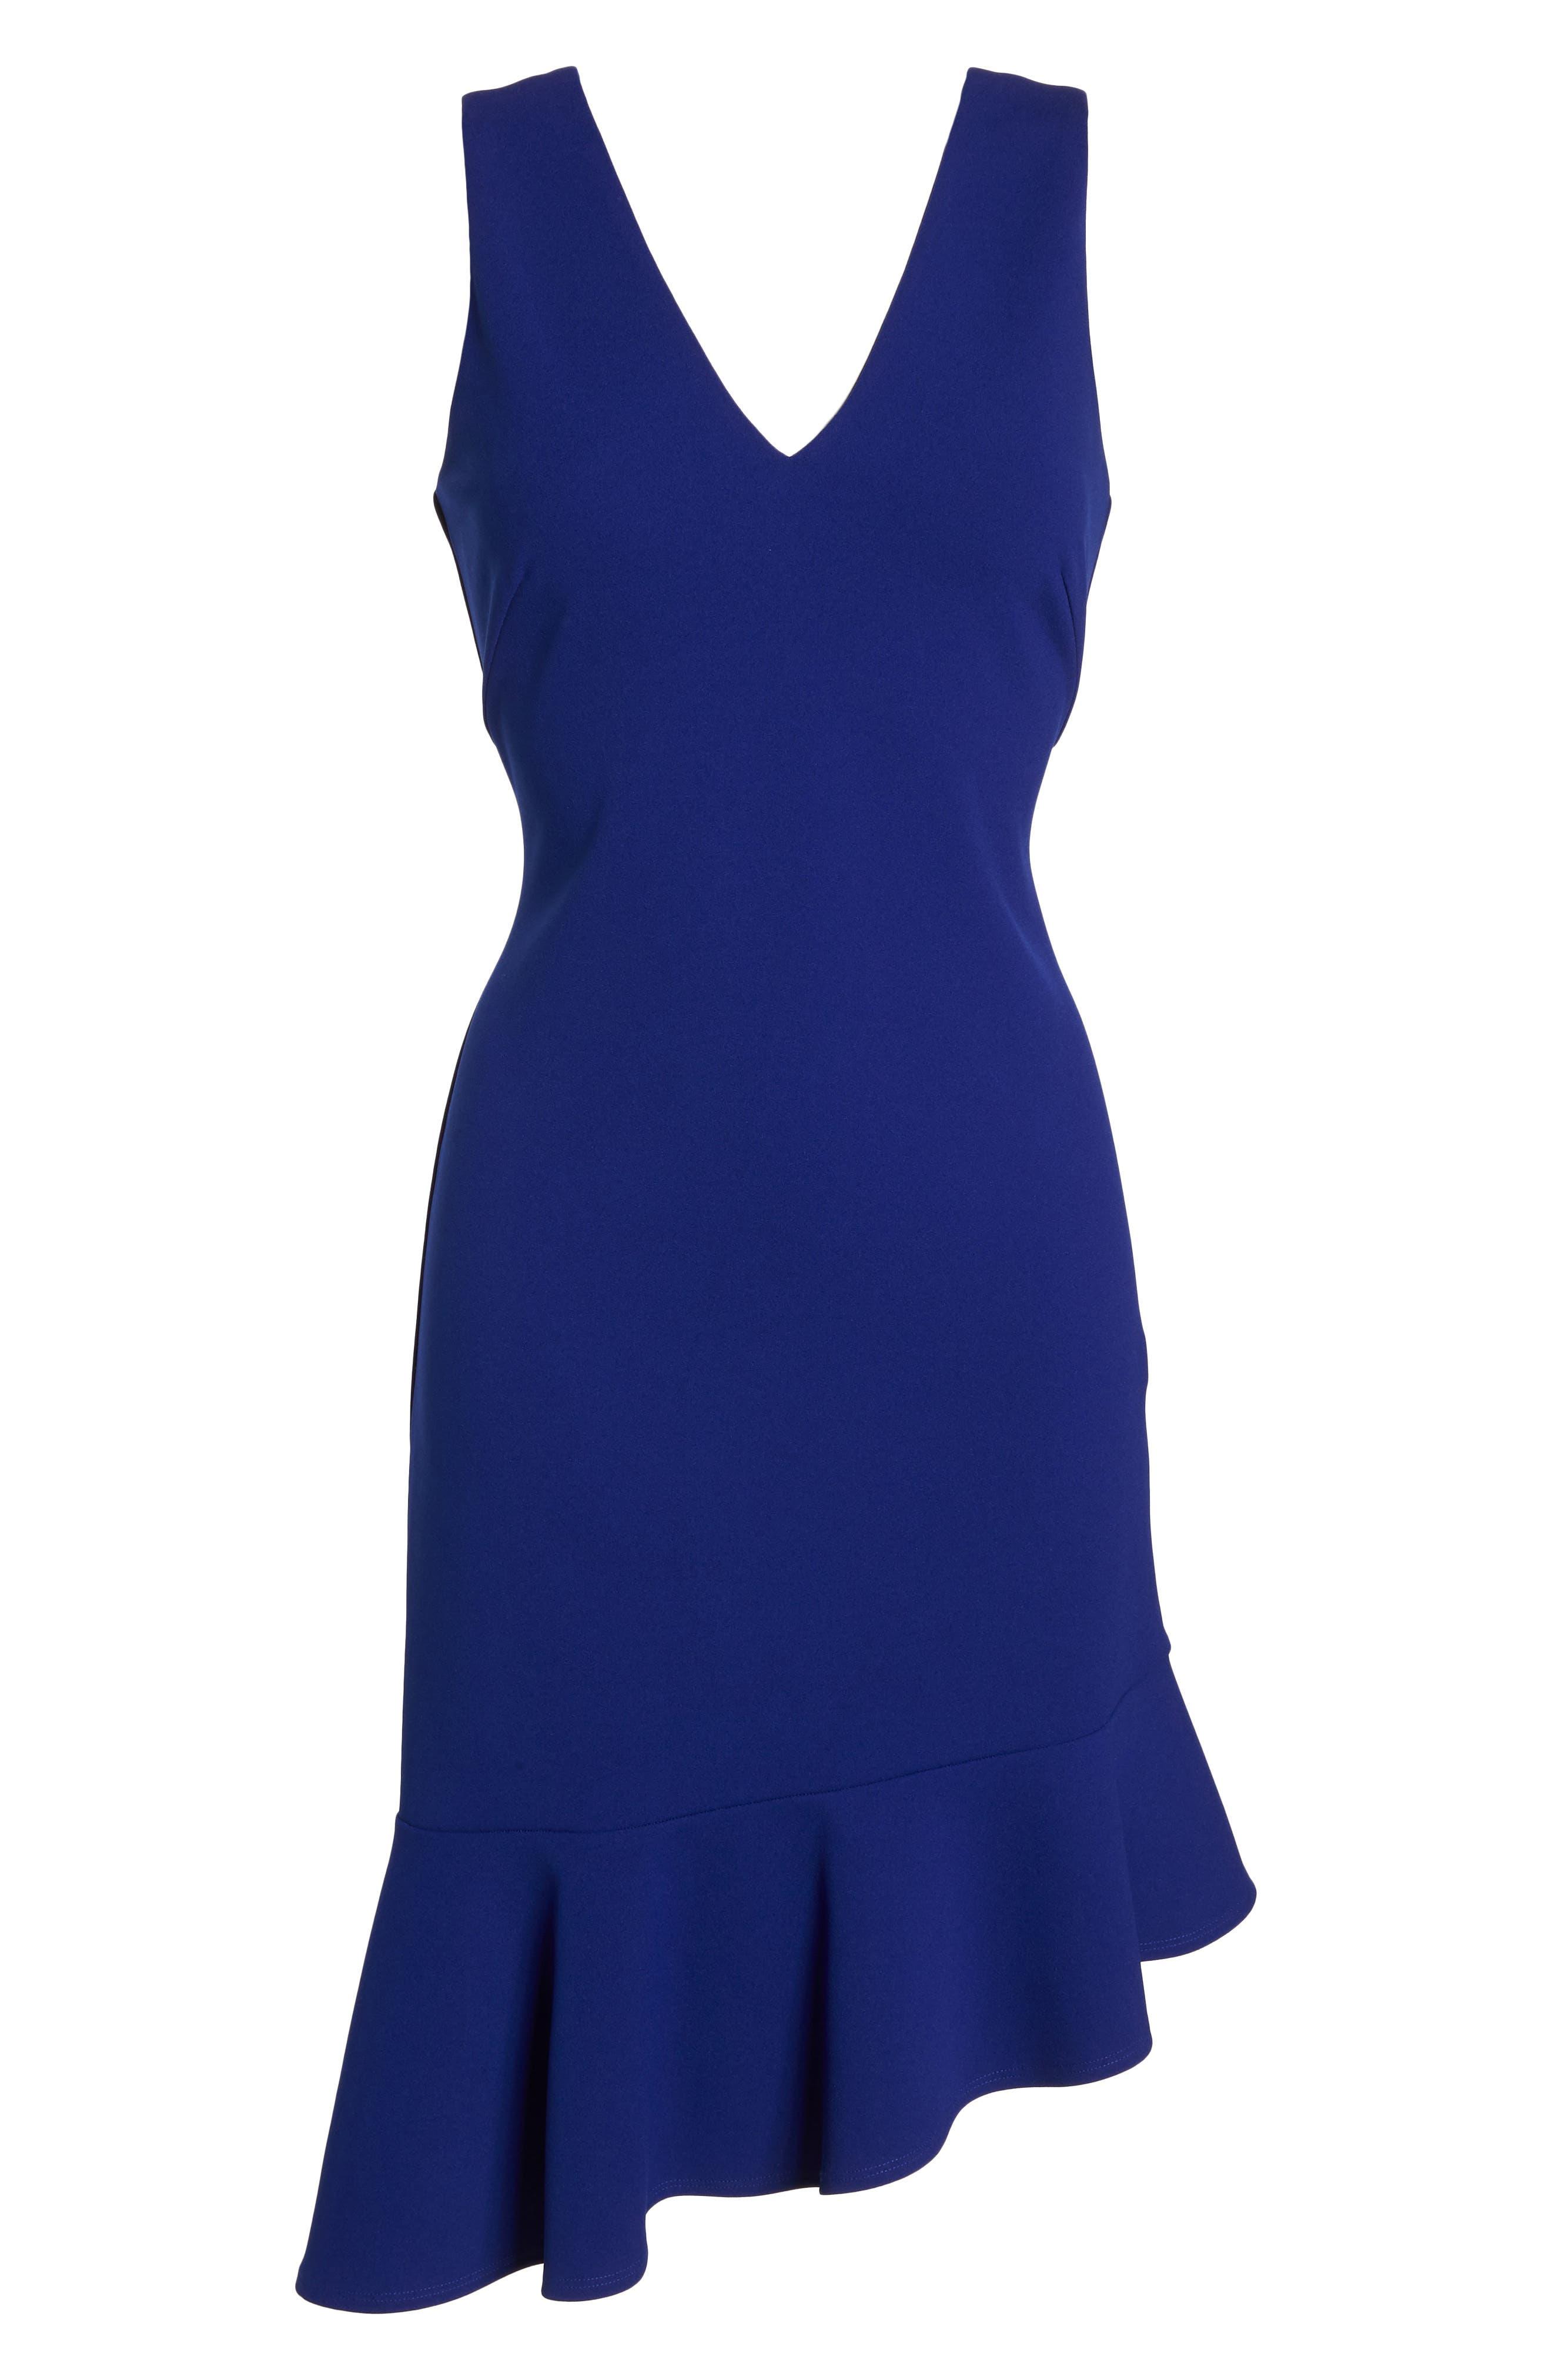 VINCE CAMUTO,                             Asymmetrical Ruffle Hem Scuba Crepe Dress,                             Alternate thumbnail 7, color,                             430